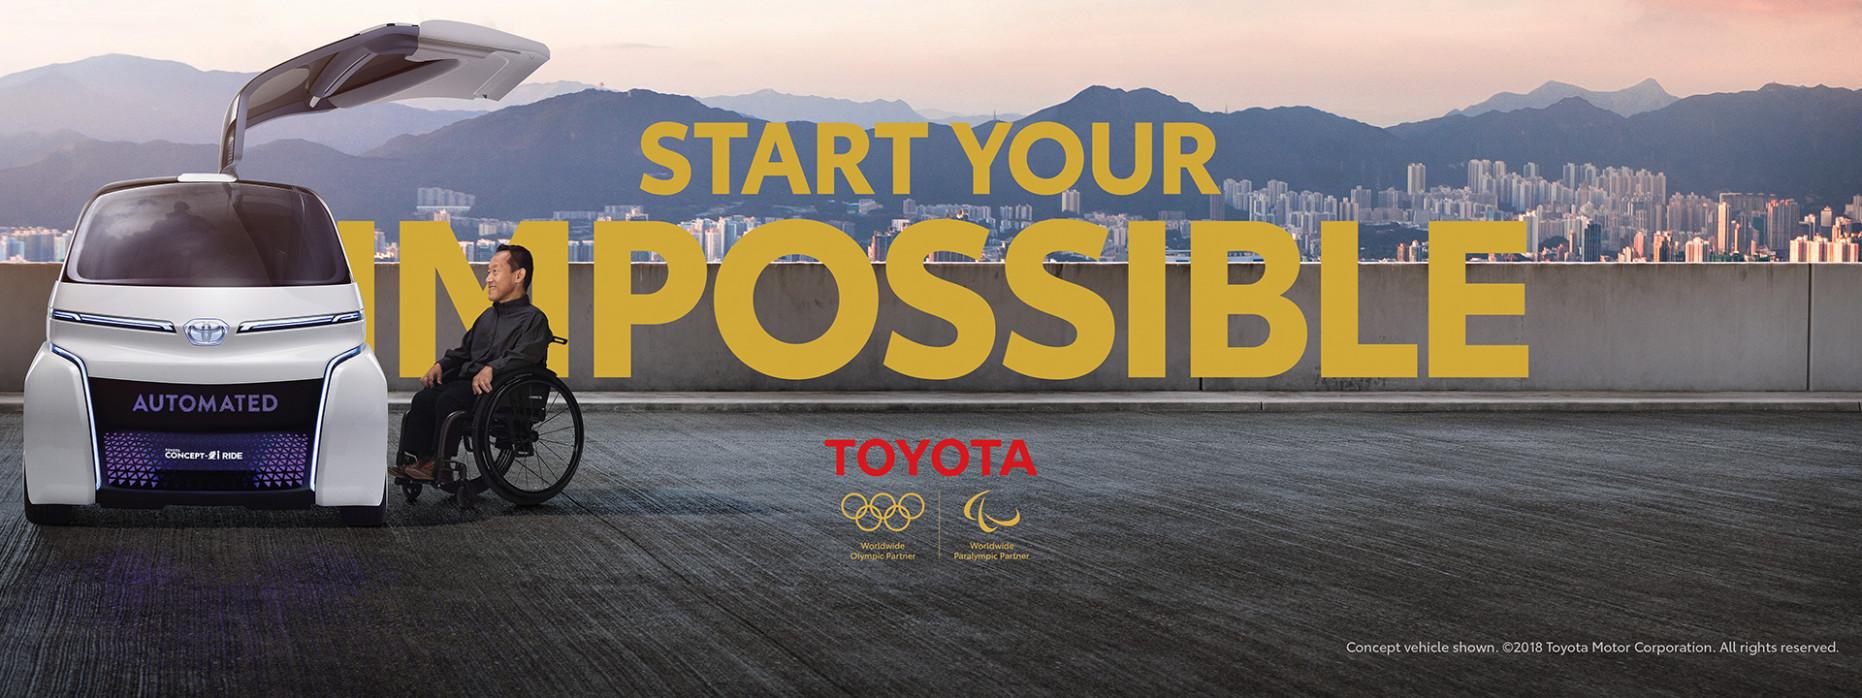 Redesign Toyota Olympics 2022